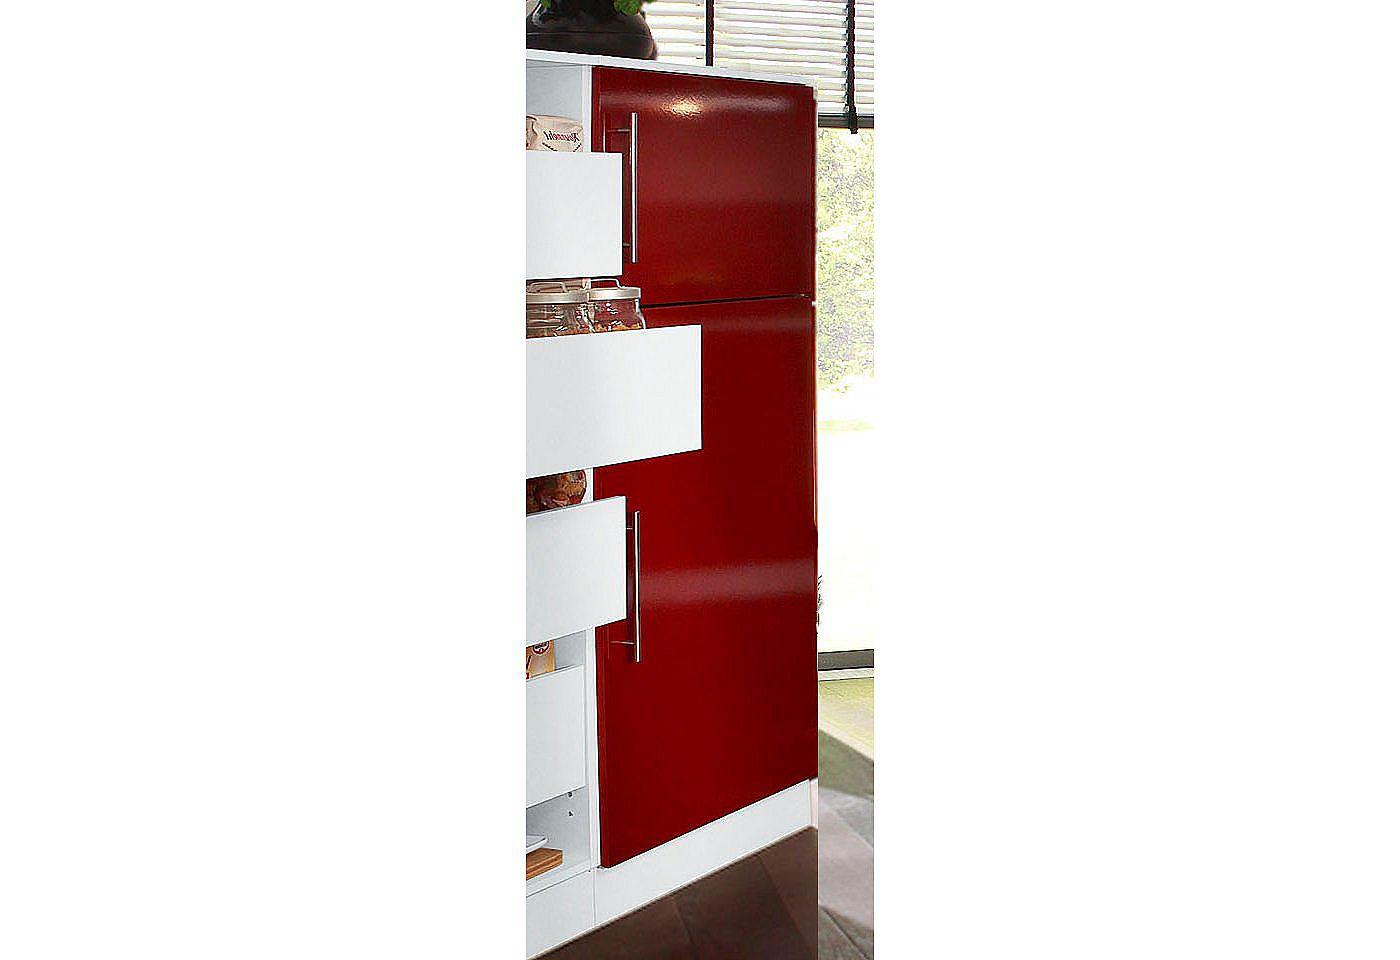 Keukenkasten Ophangen : Ophangen kasten - Duifwitgoedservice